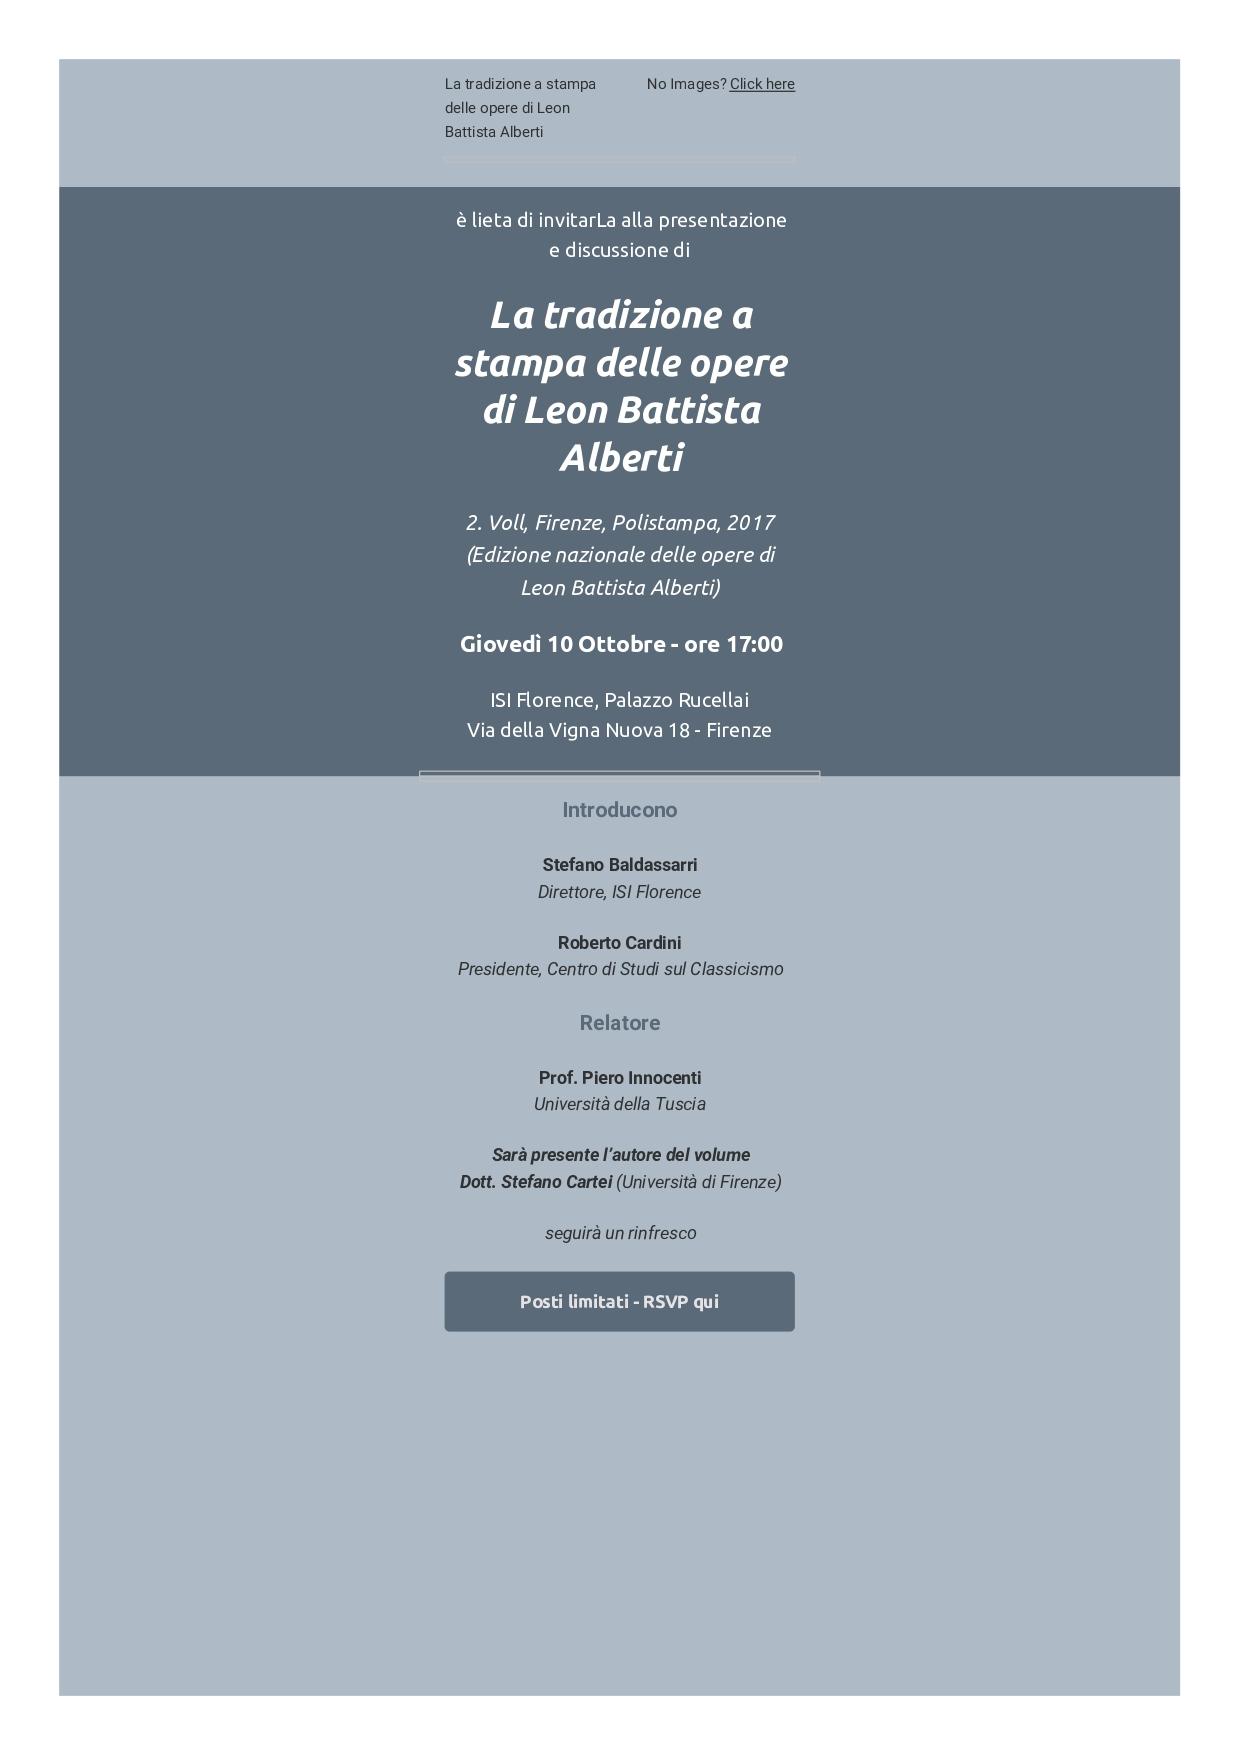 Cartei locandina_page-0001